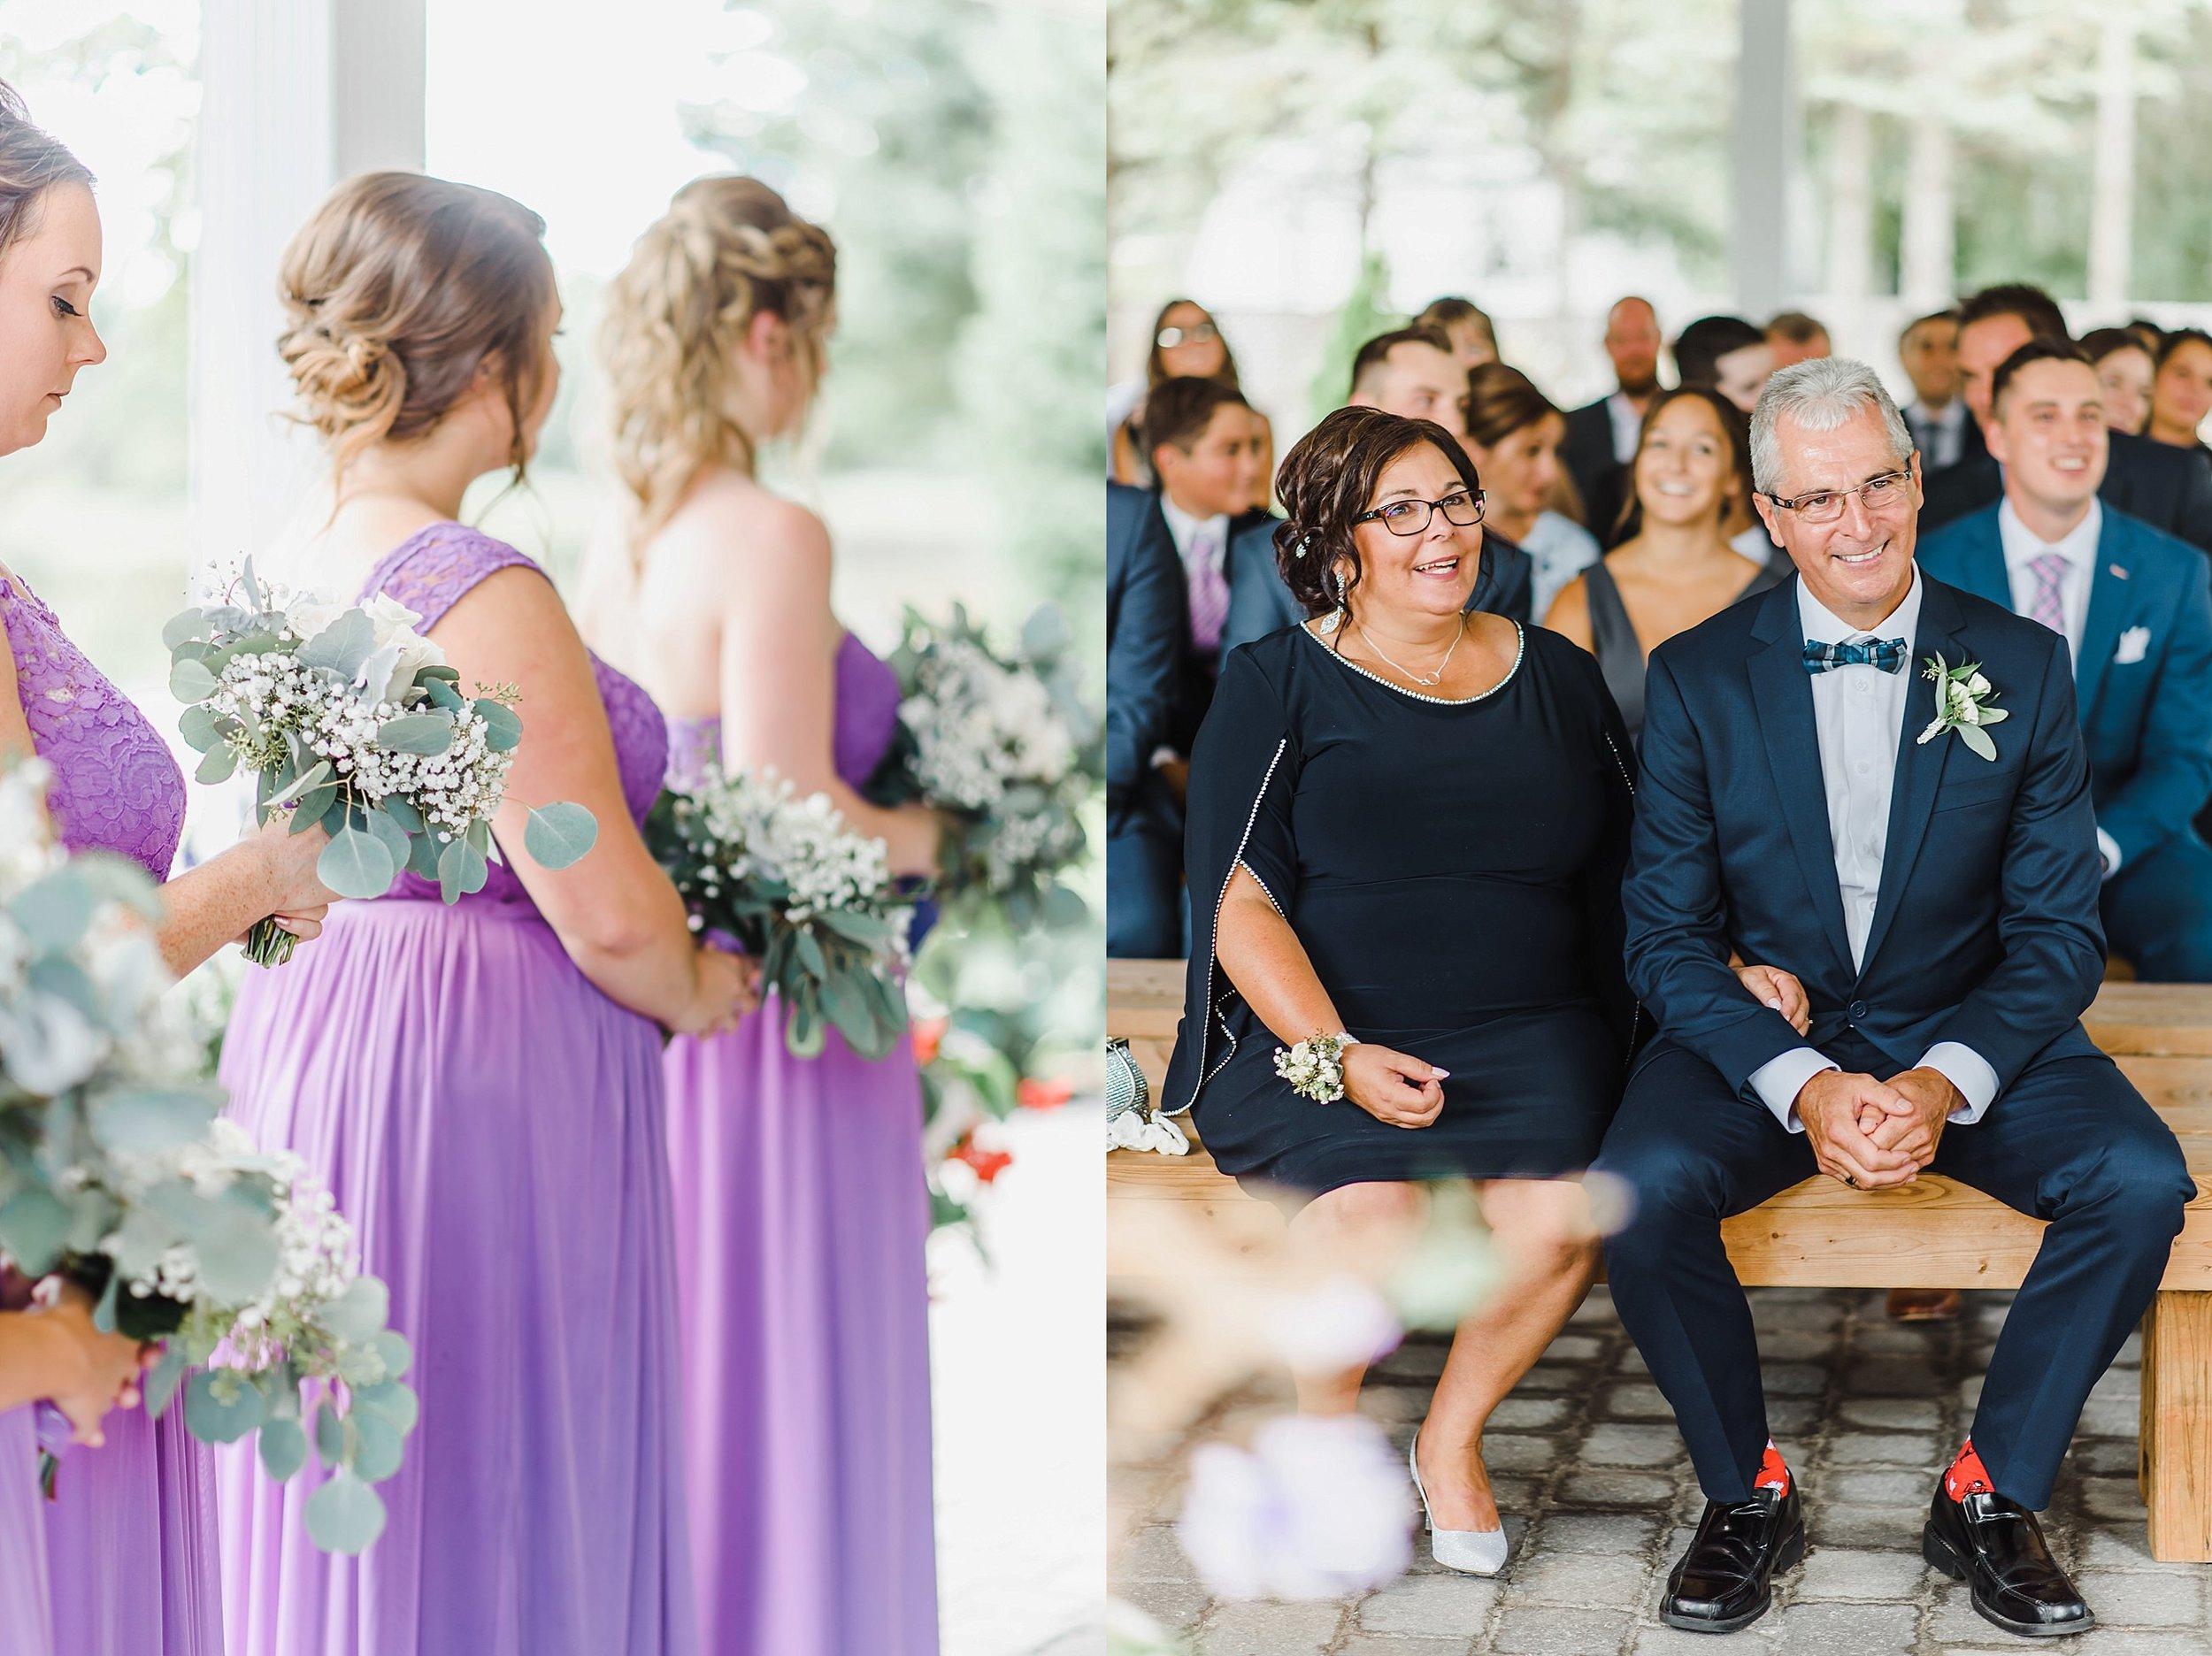 light airy indie fine art ottawa wedding photographer | Ali and Batoul Photography_1273.jpg